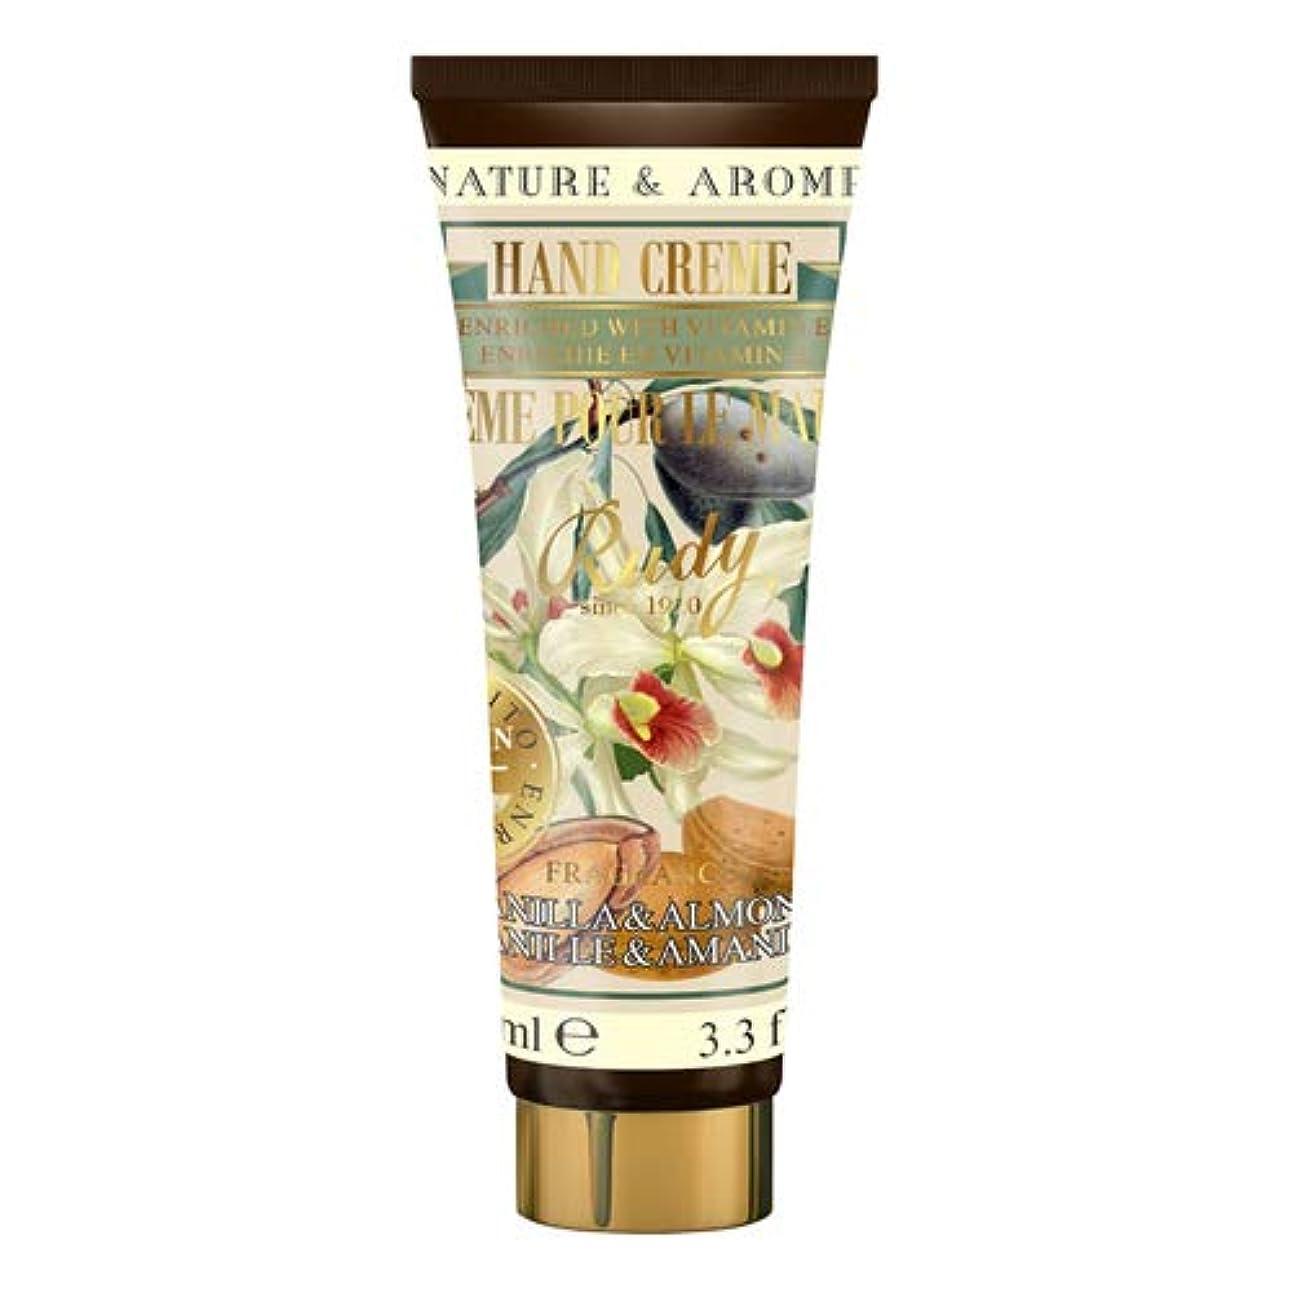 RUDY Nature&Arome Apothecary ネイチャーアロマ アポセカリー Hand Cream ハンドクリーム Vanilla & Almond バニラ&アーモンド